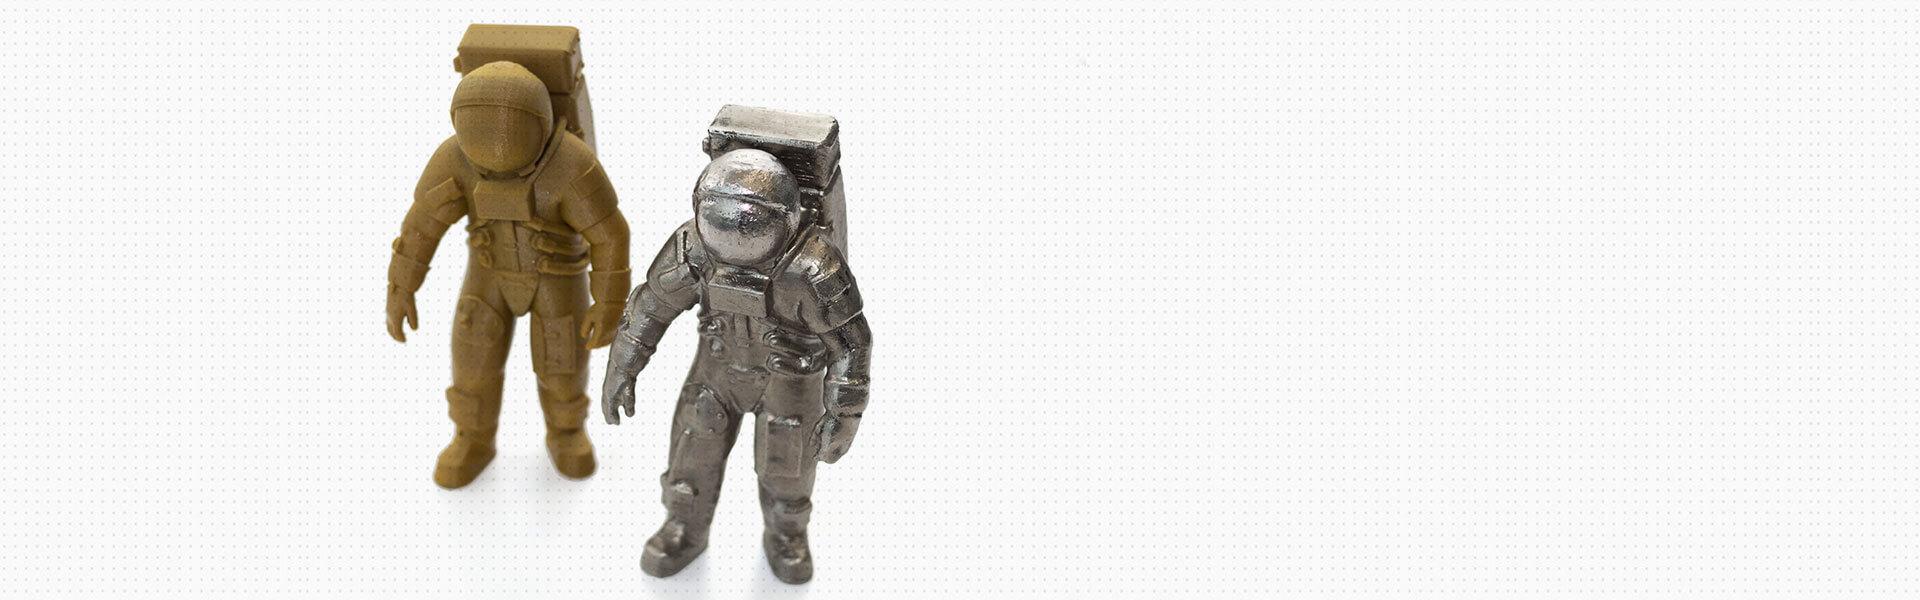 https://www.castem.com.co/sites/default/files/revslider/image/astronautas2castem.jpg